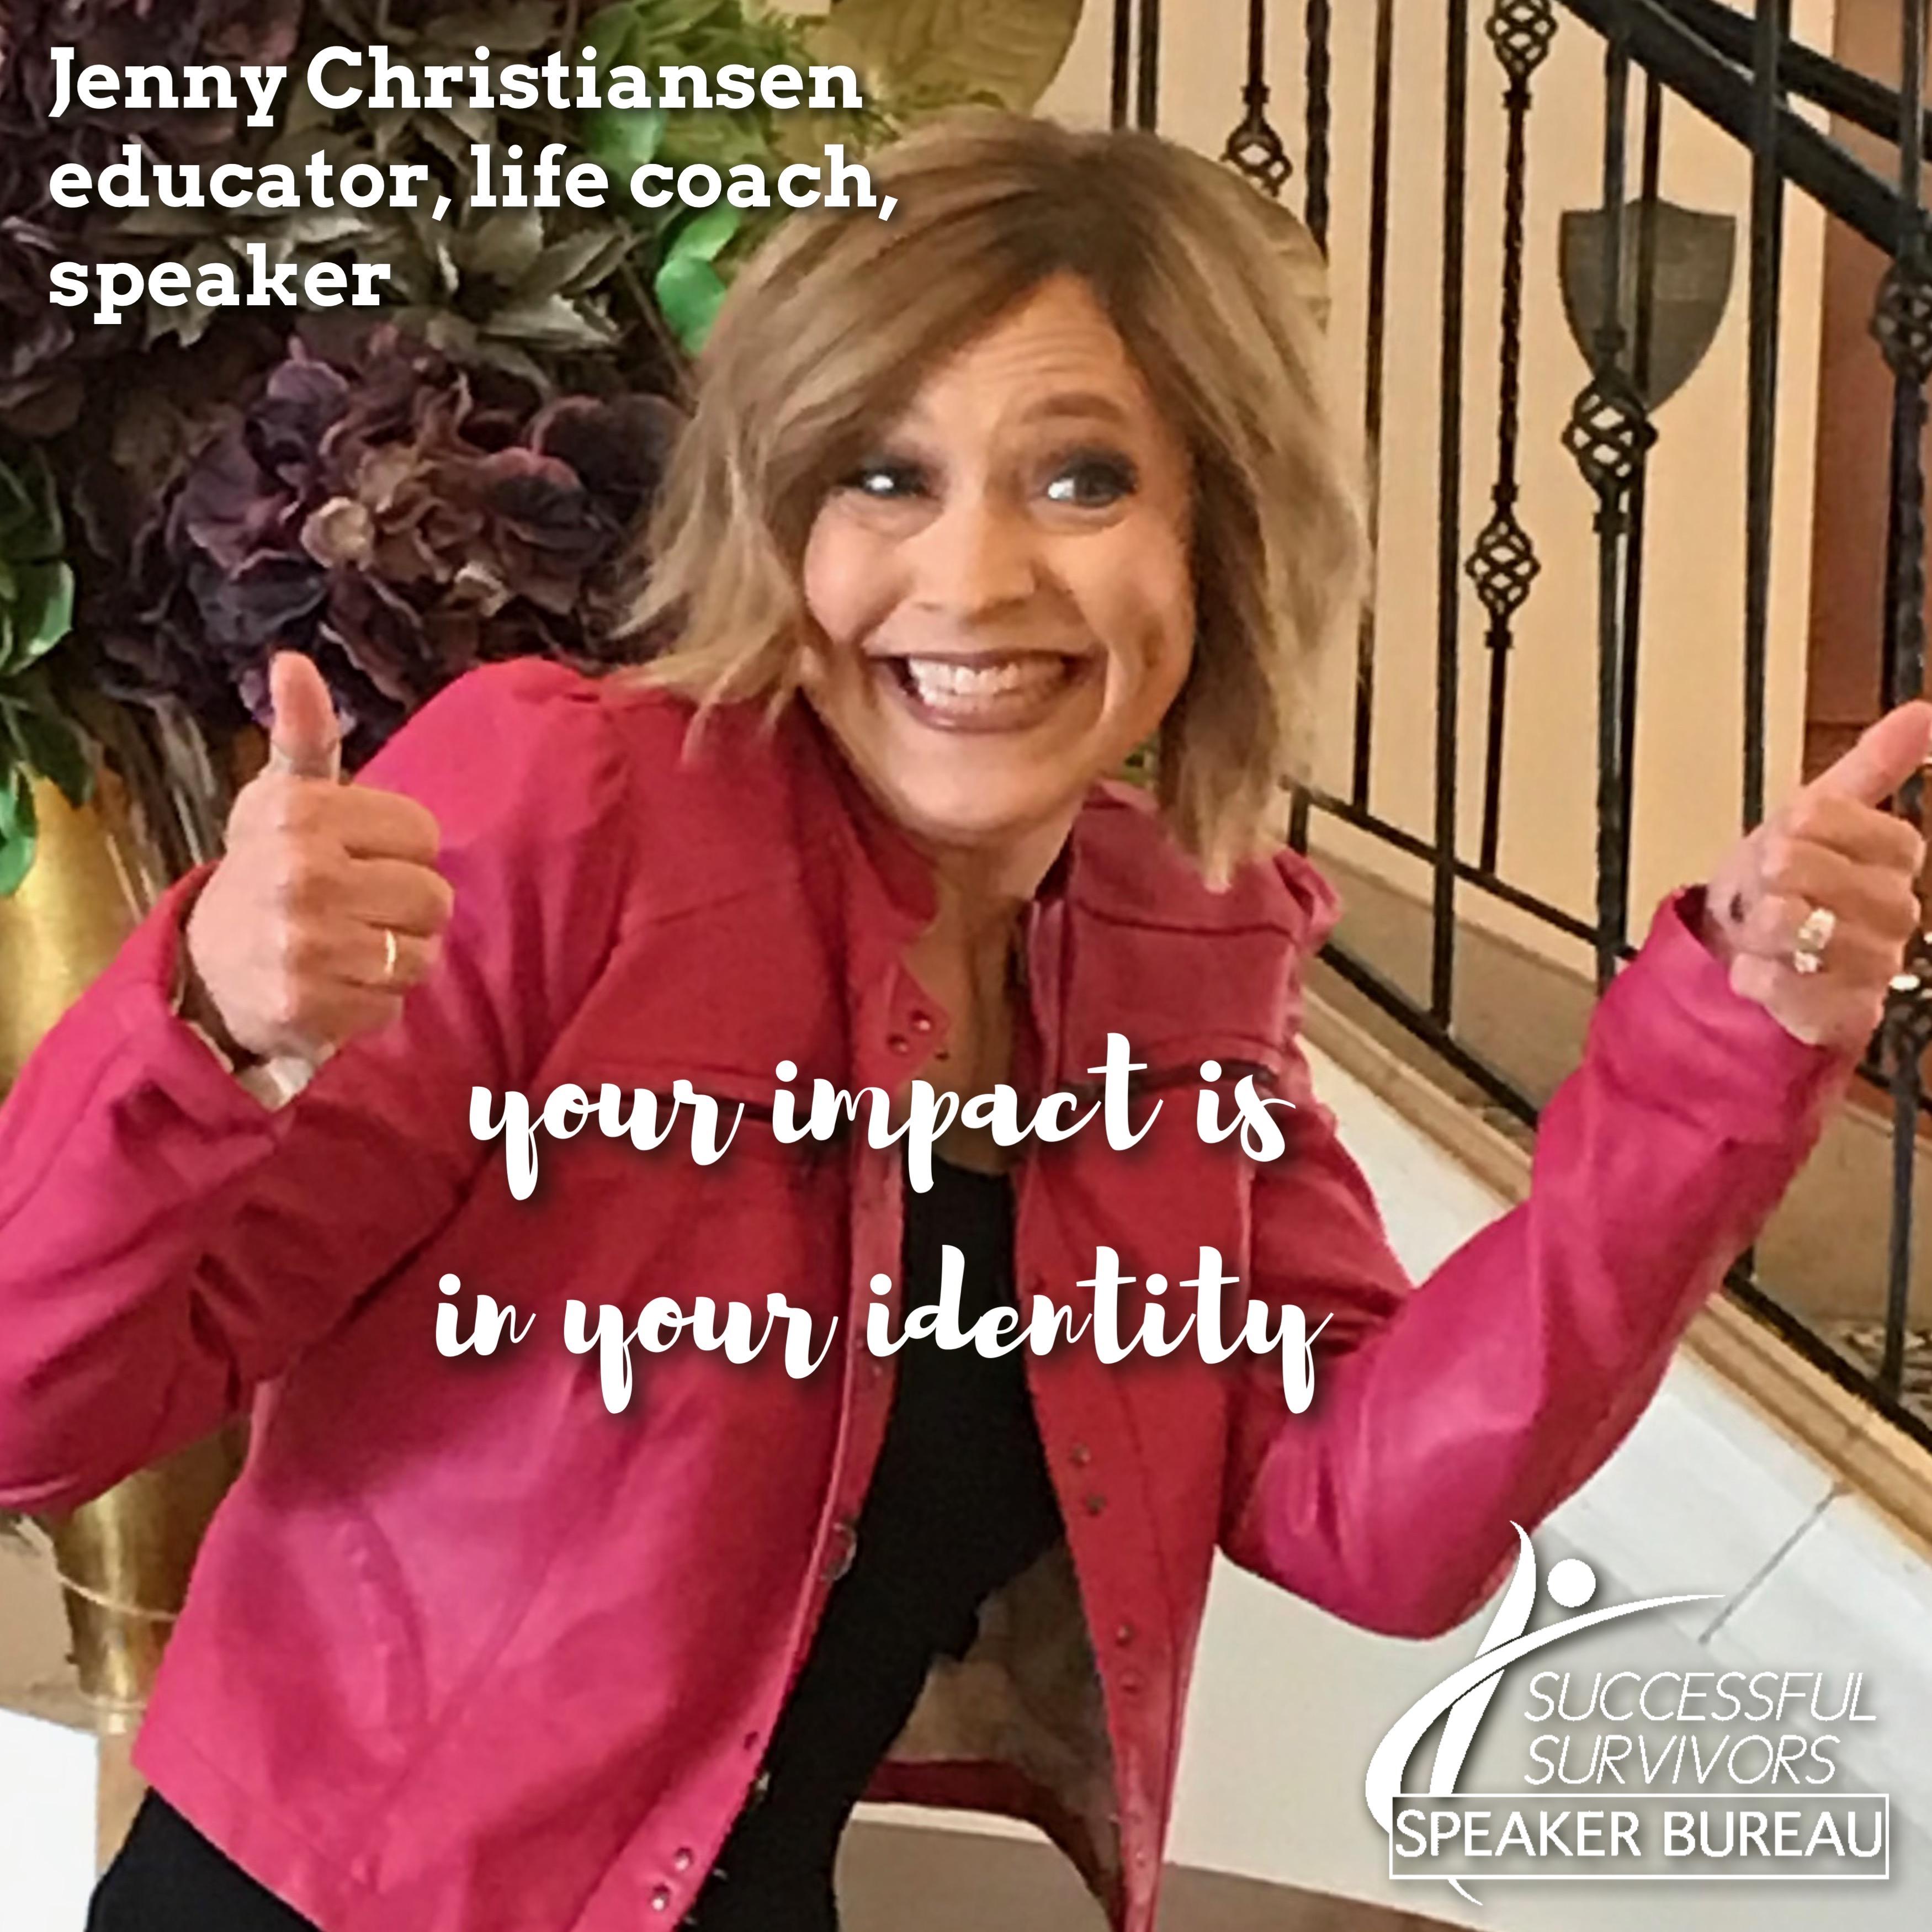 Jenny Christiansen